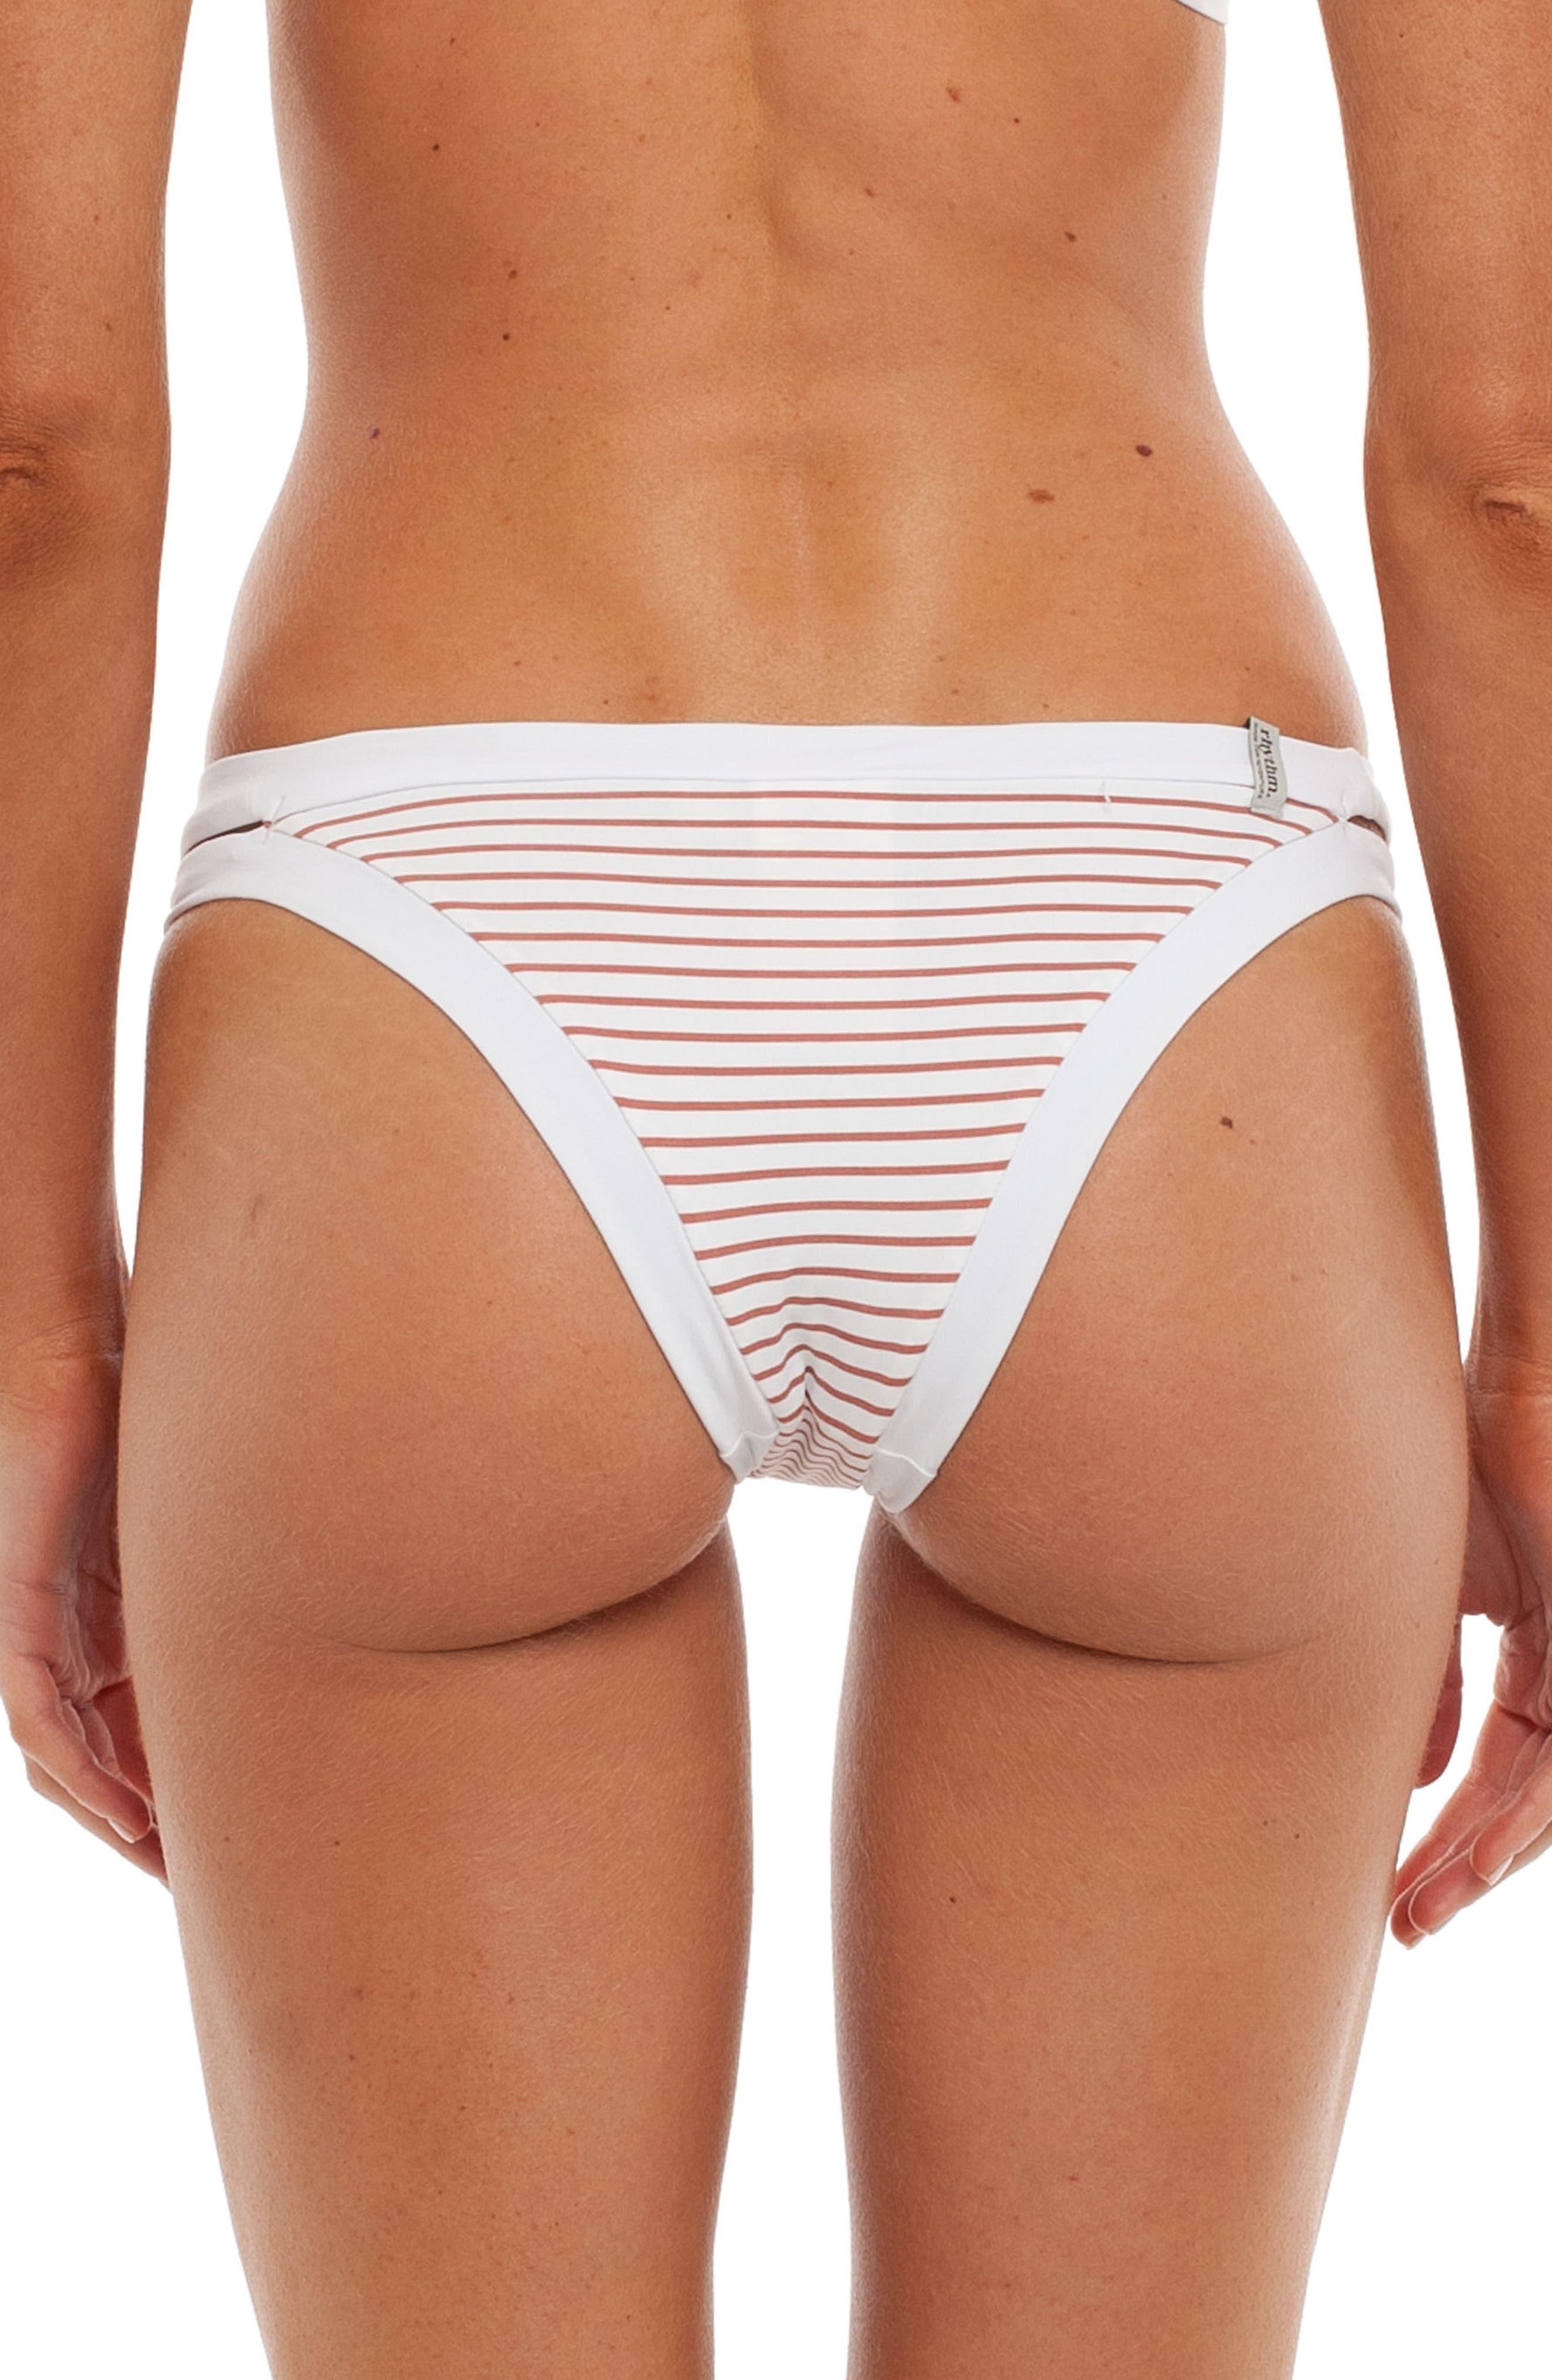 Main Image - Rhythm Sunkissed Itsy Bikini Bottoms